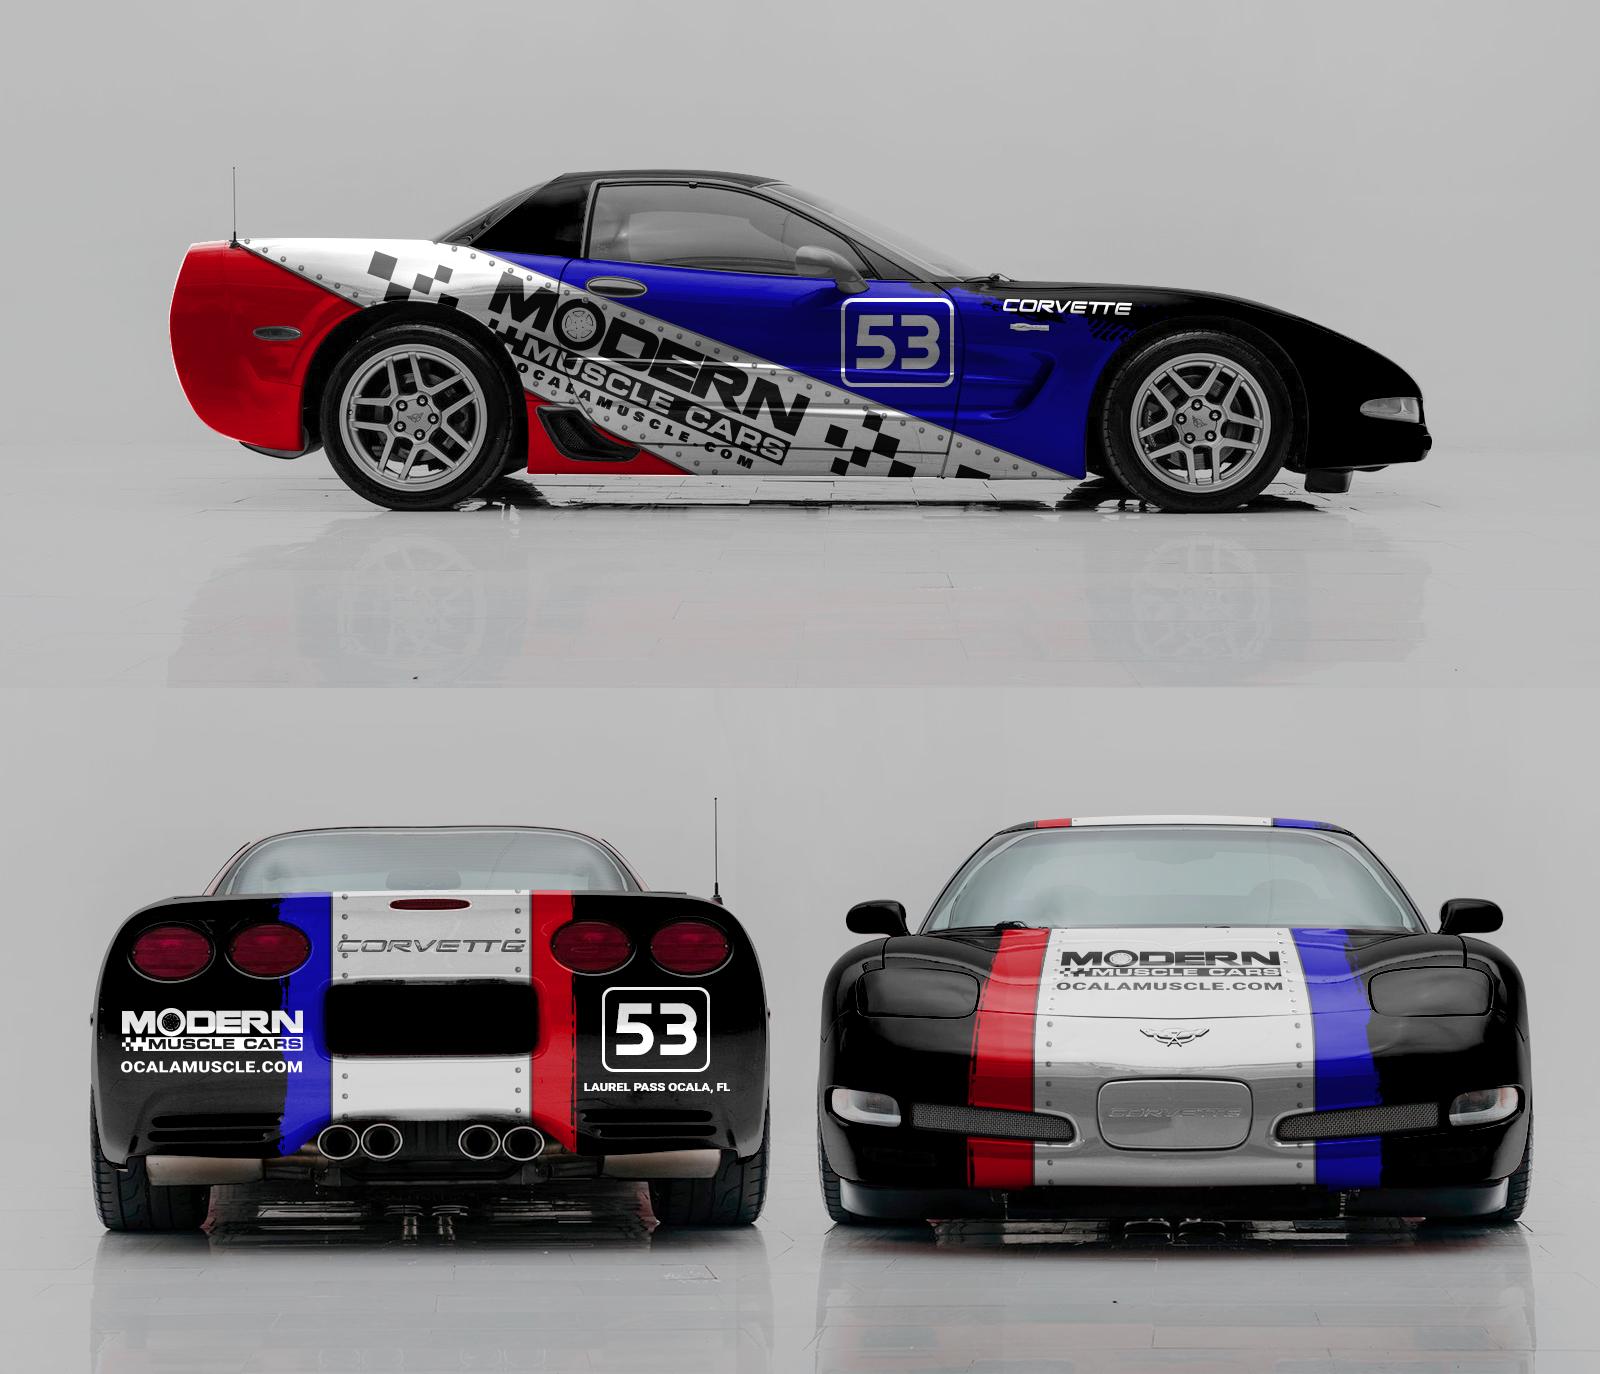 Design a cool Race Car look for our 2001 Corvette Z06